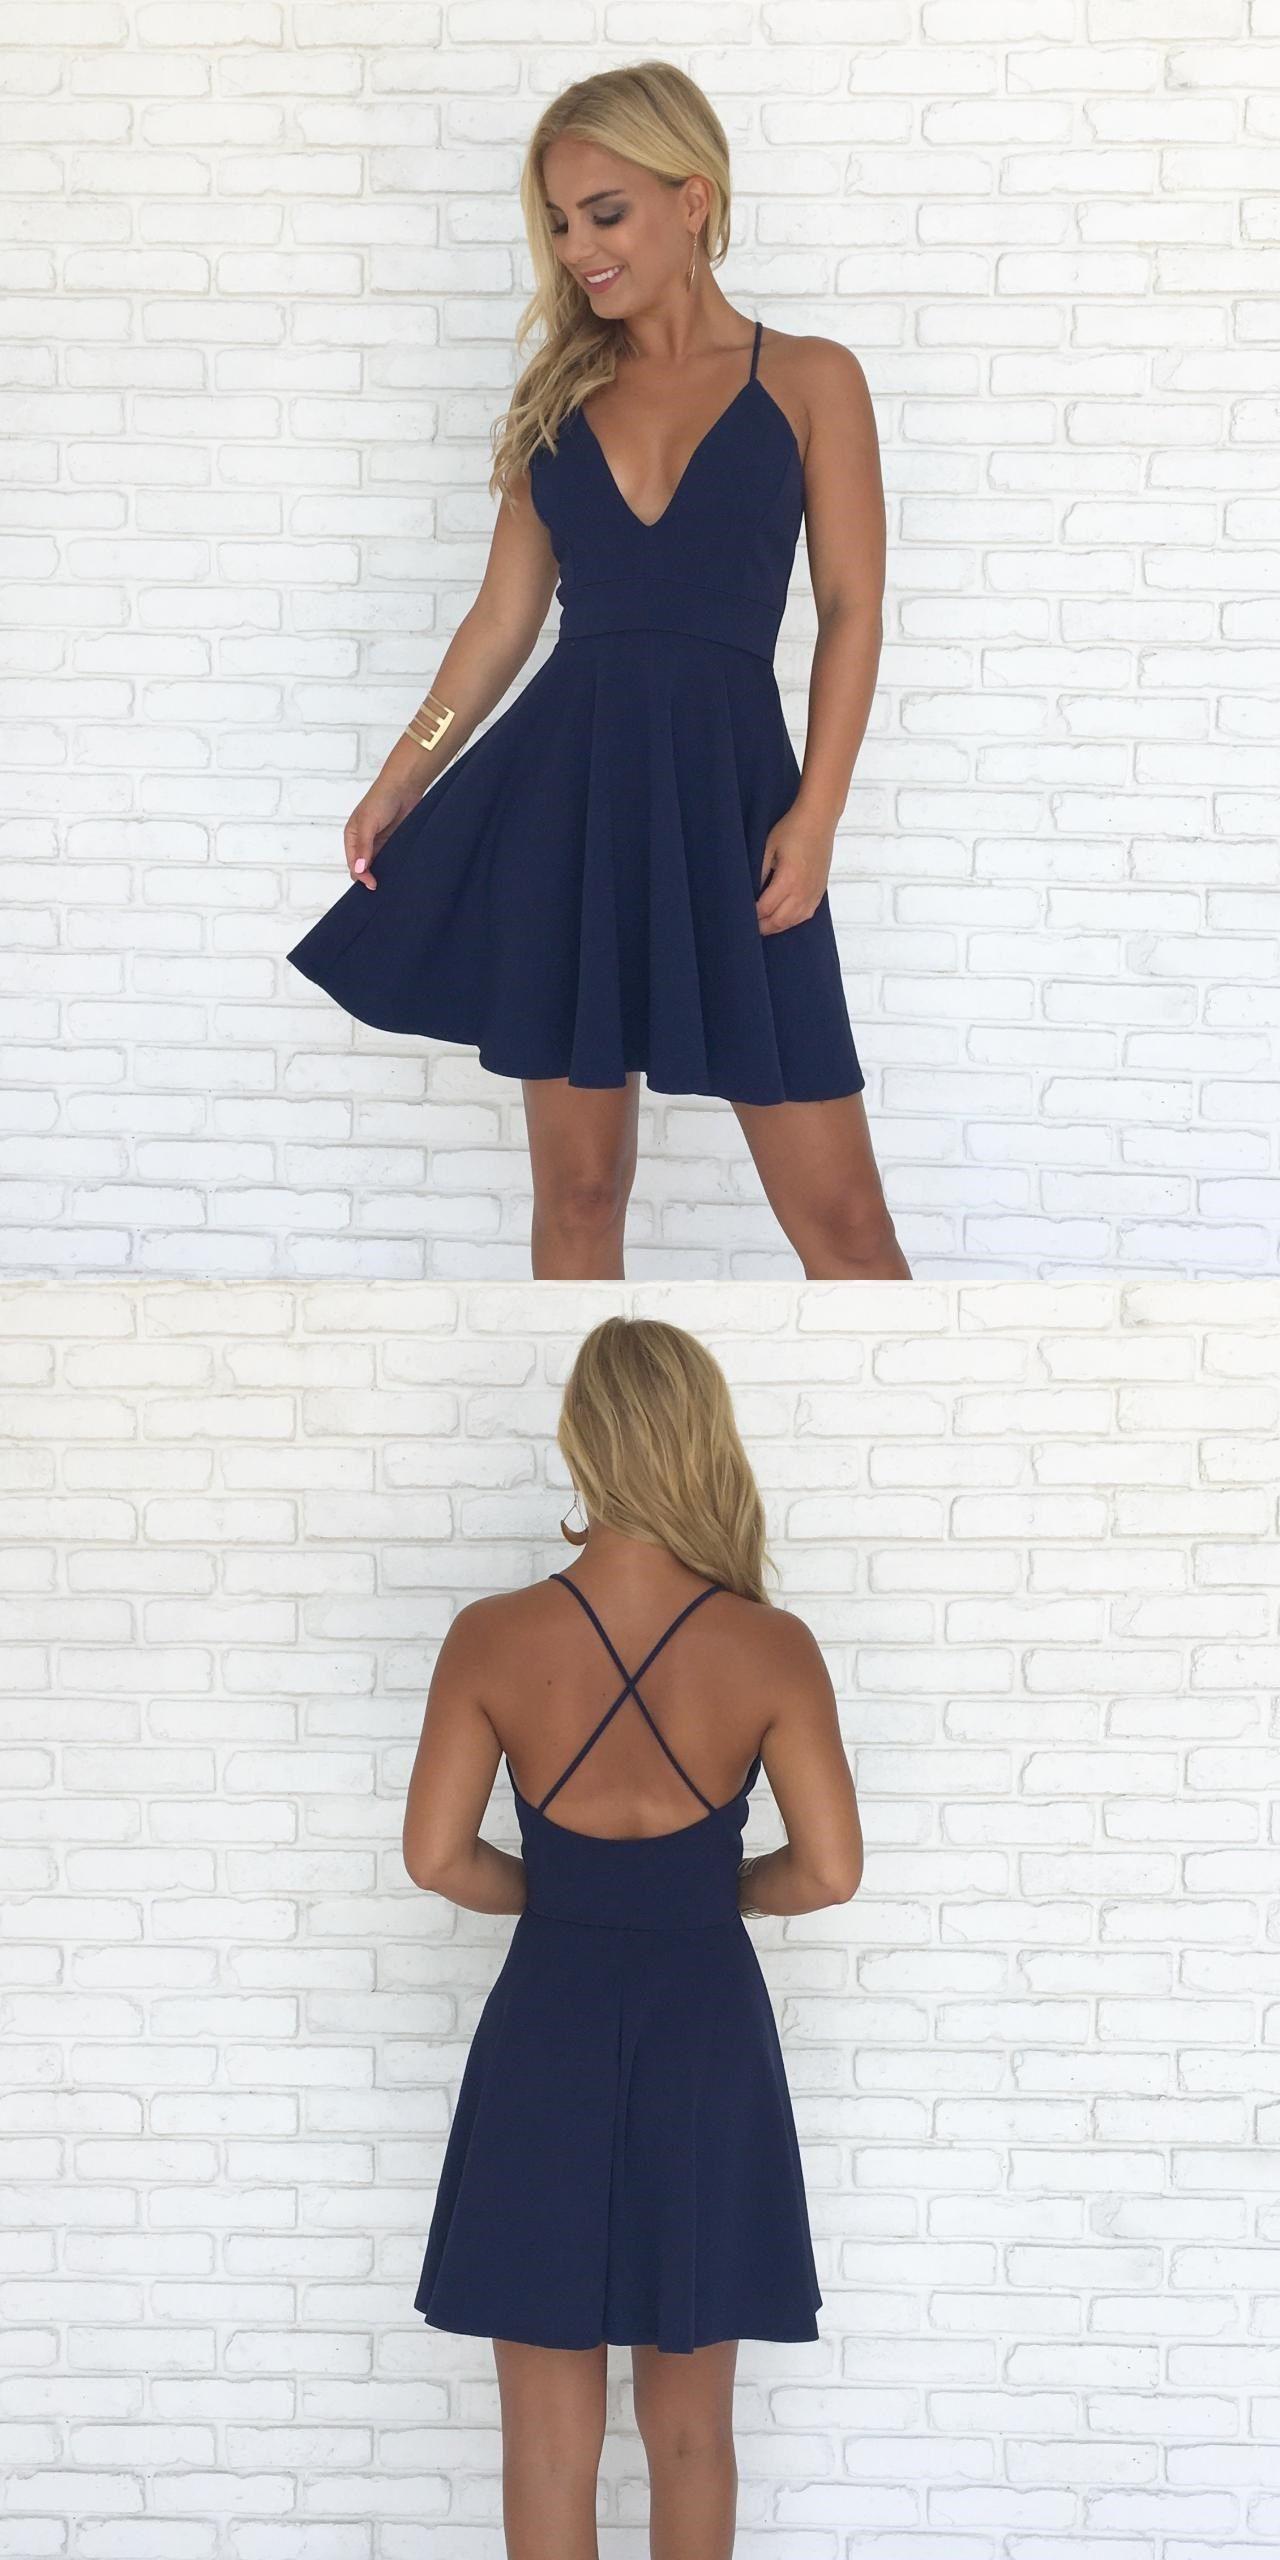 06f34611a56 Cute Spaghetti Straps V-Neck Short Dresses